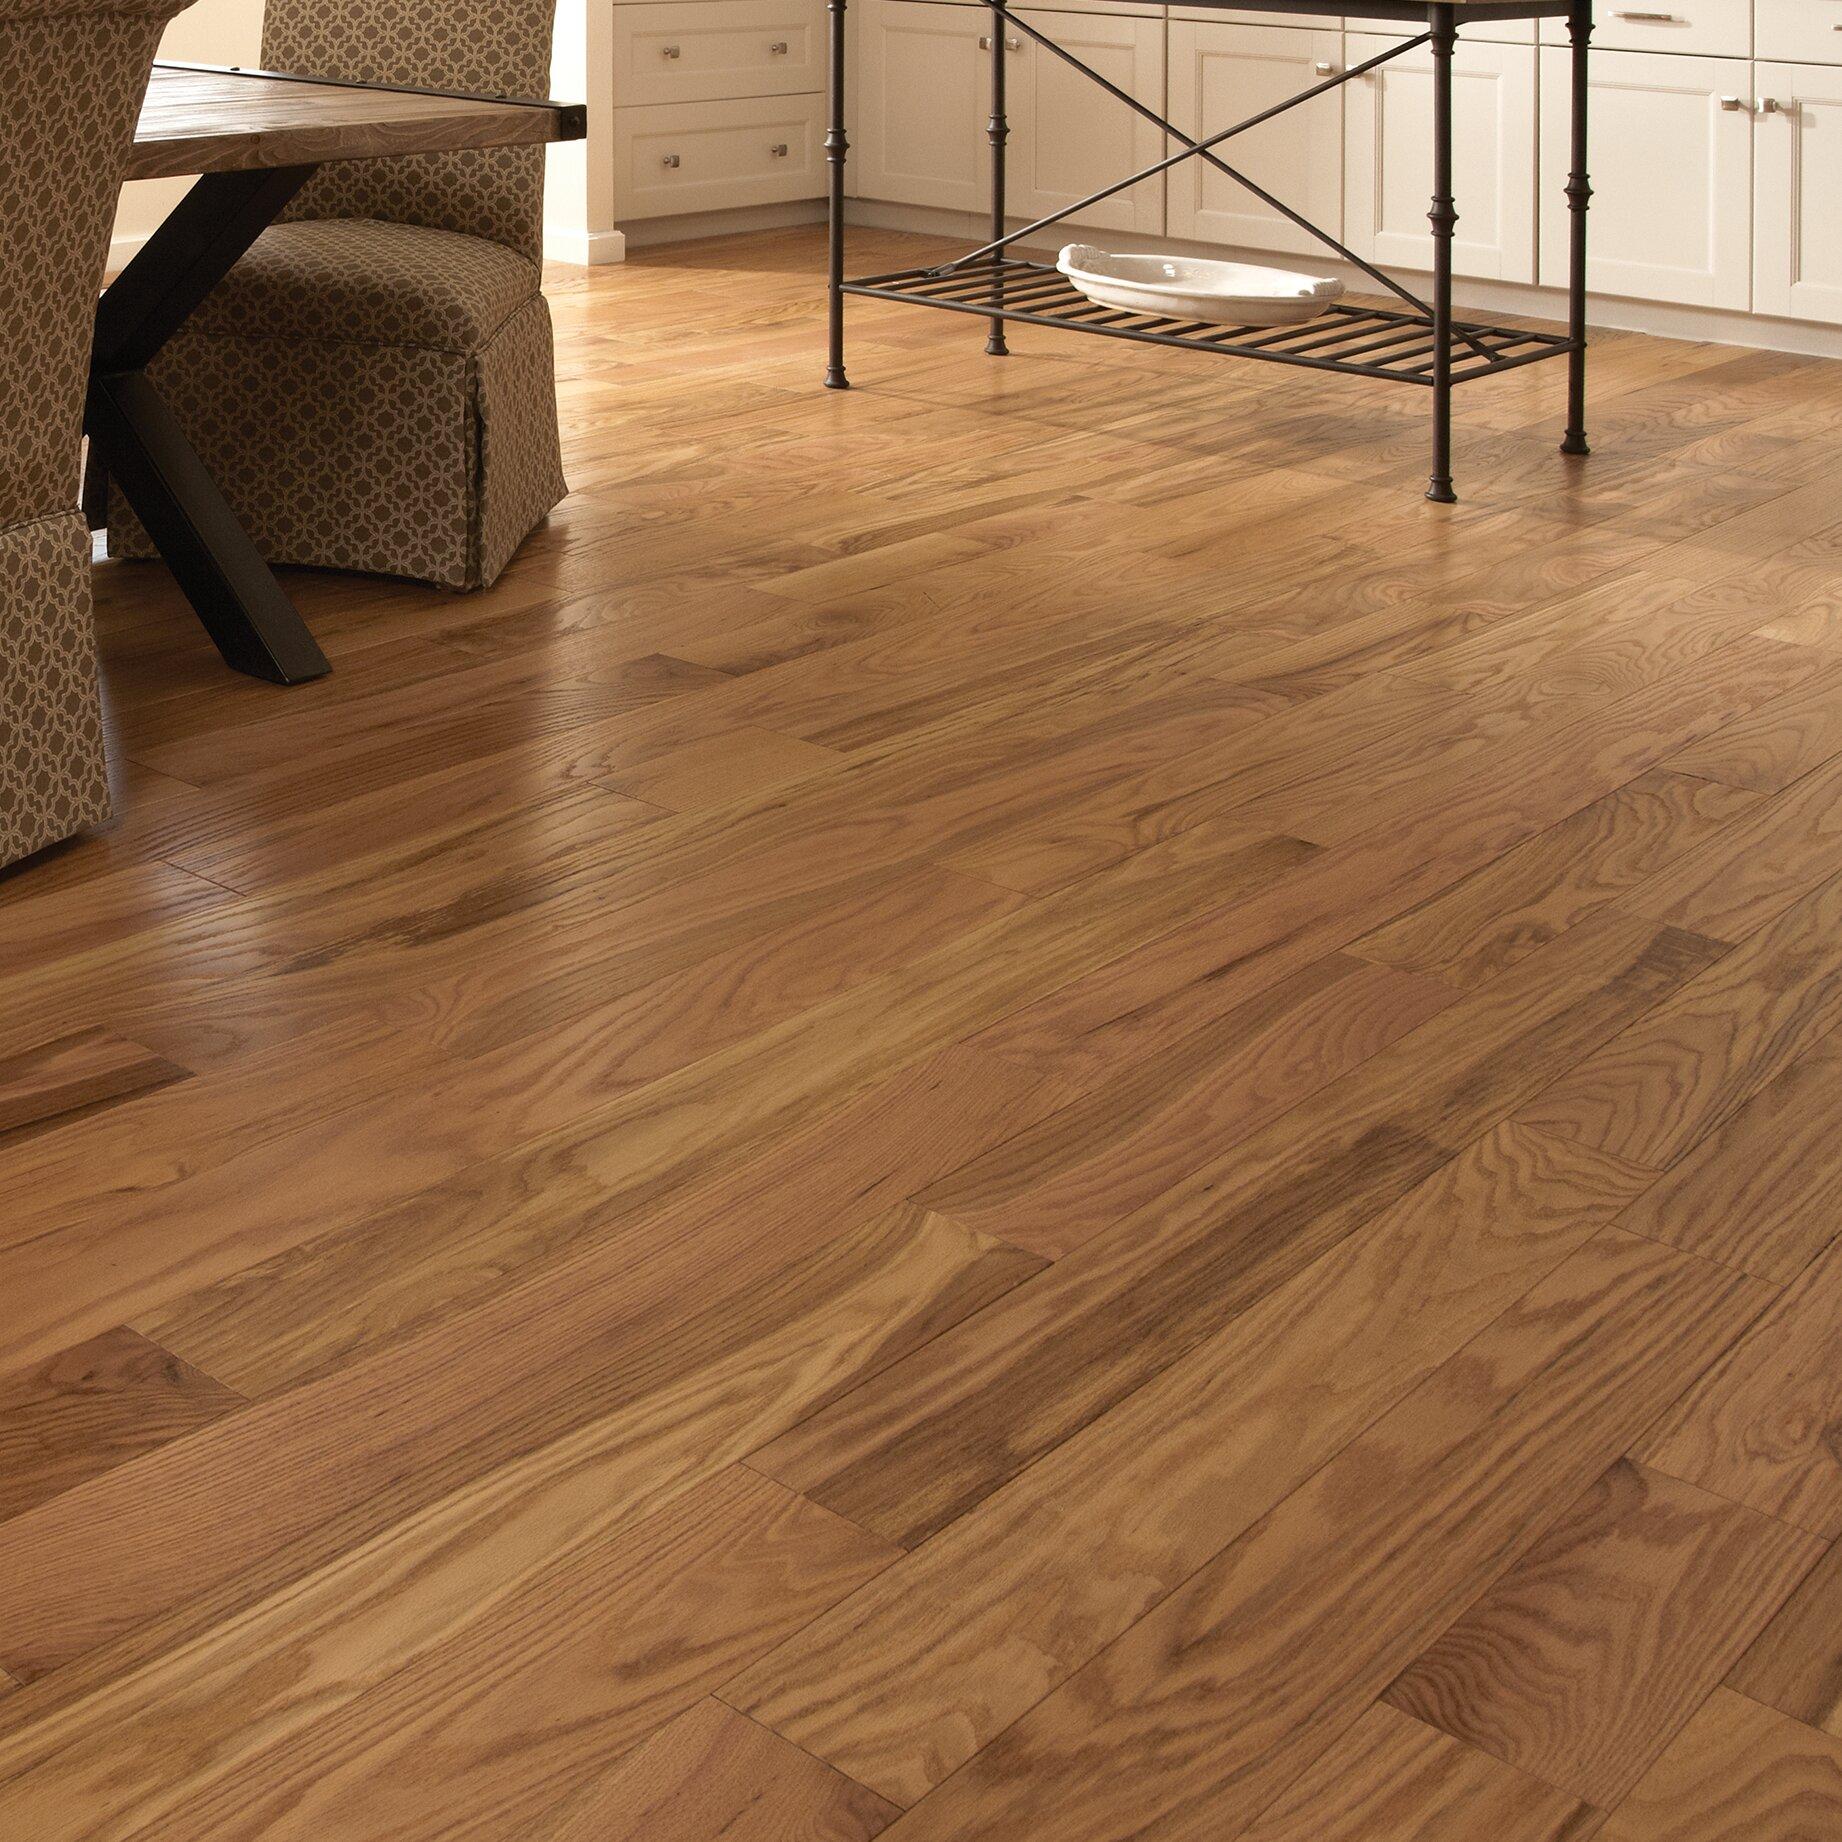 Somerset Classic 3 1 4 Engineered Oak Hardwood Flooring